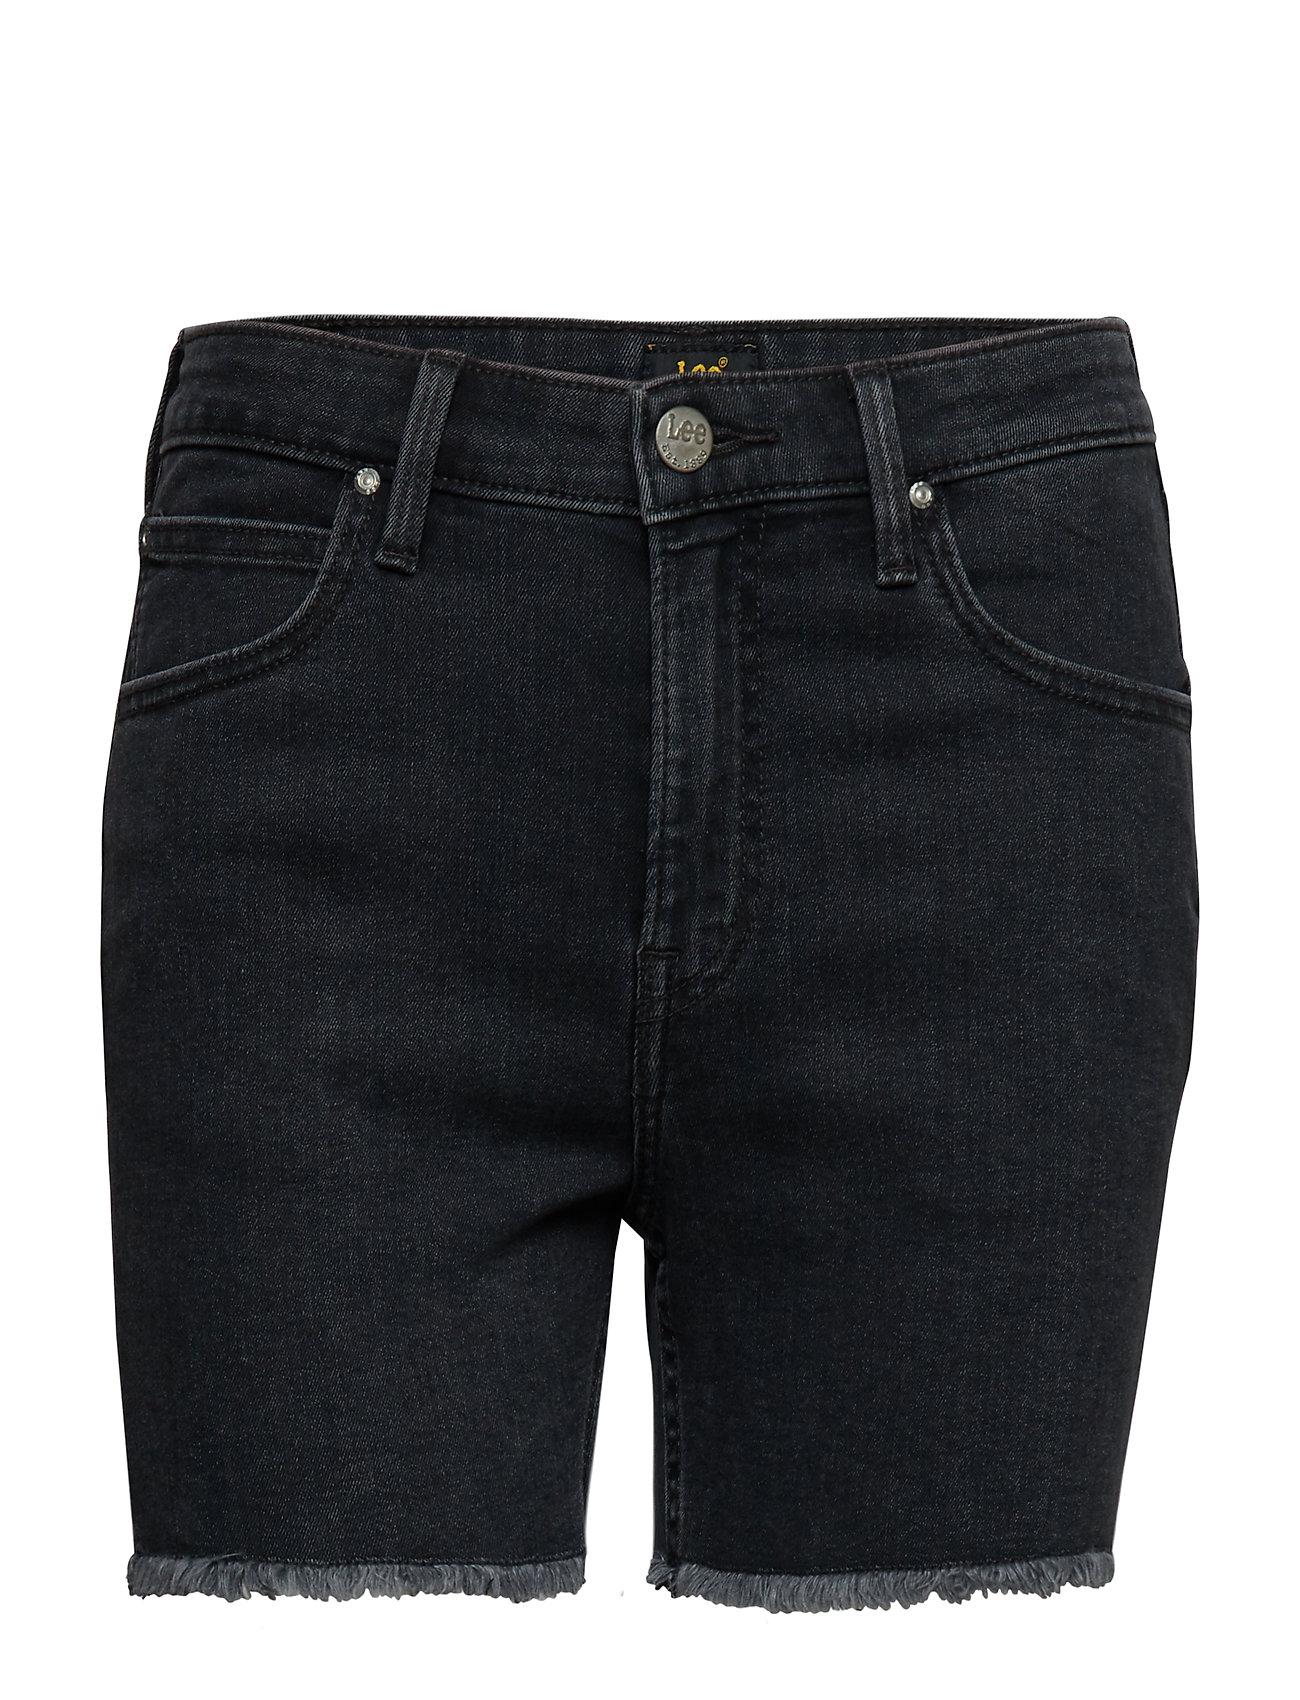 Lee Jeans BOYFRIEND SHORT - PITCH